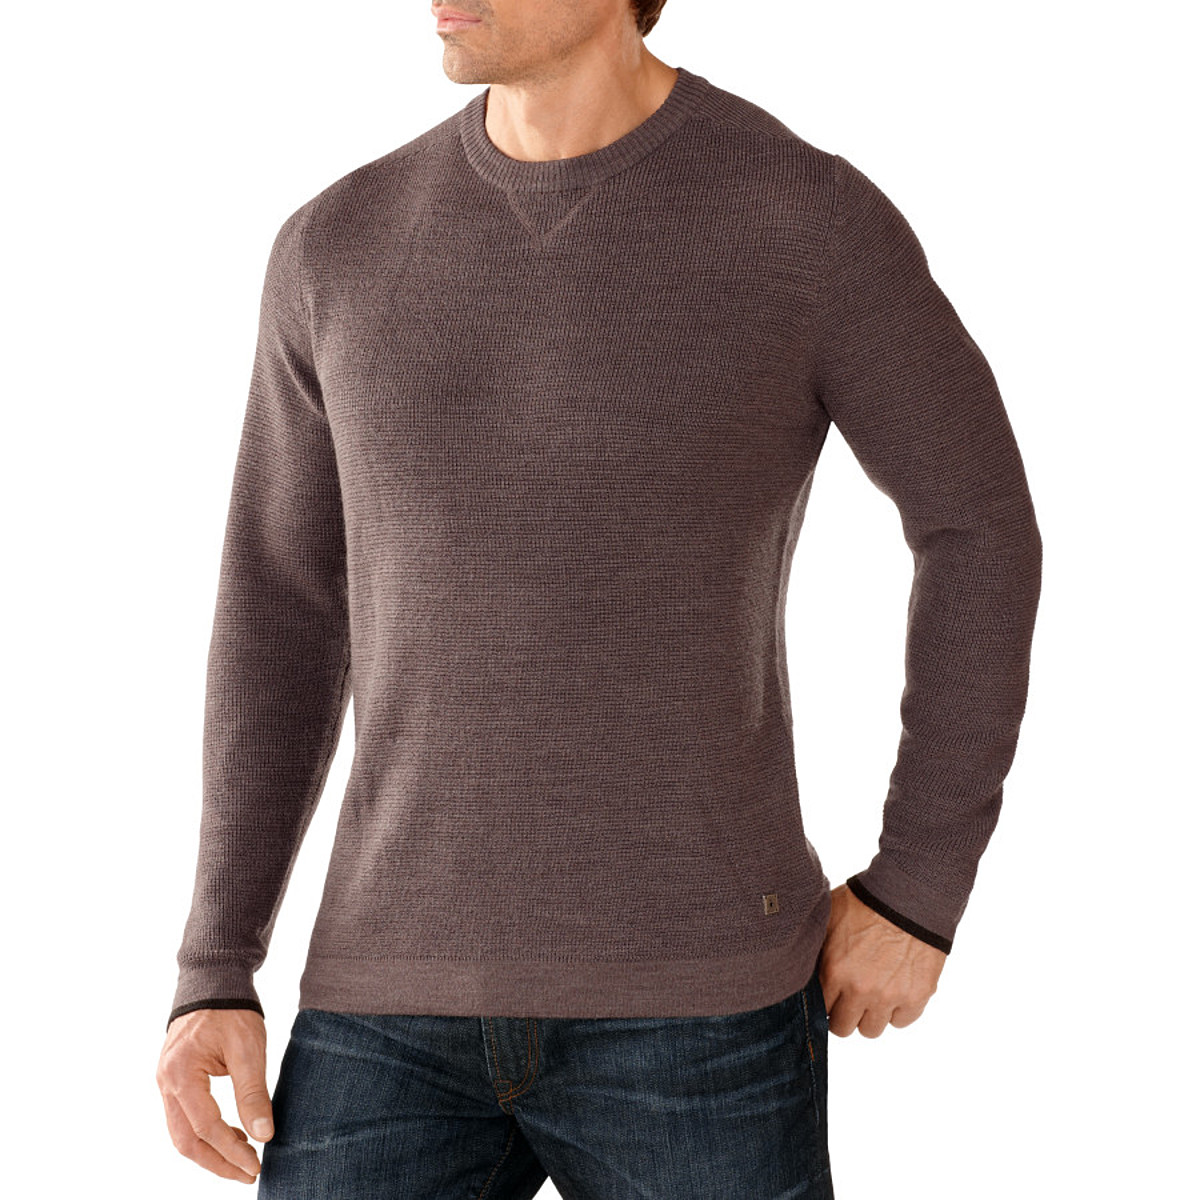 Smartwool Cheyenne Creek Crew Sweater